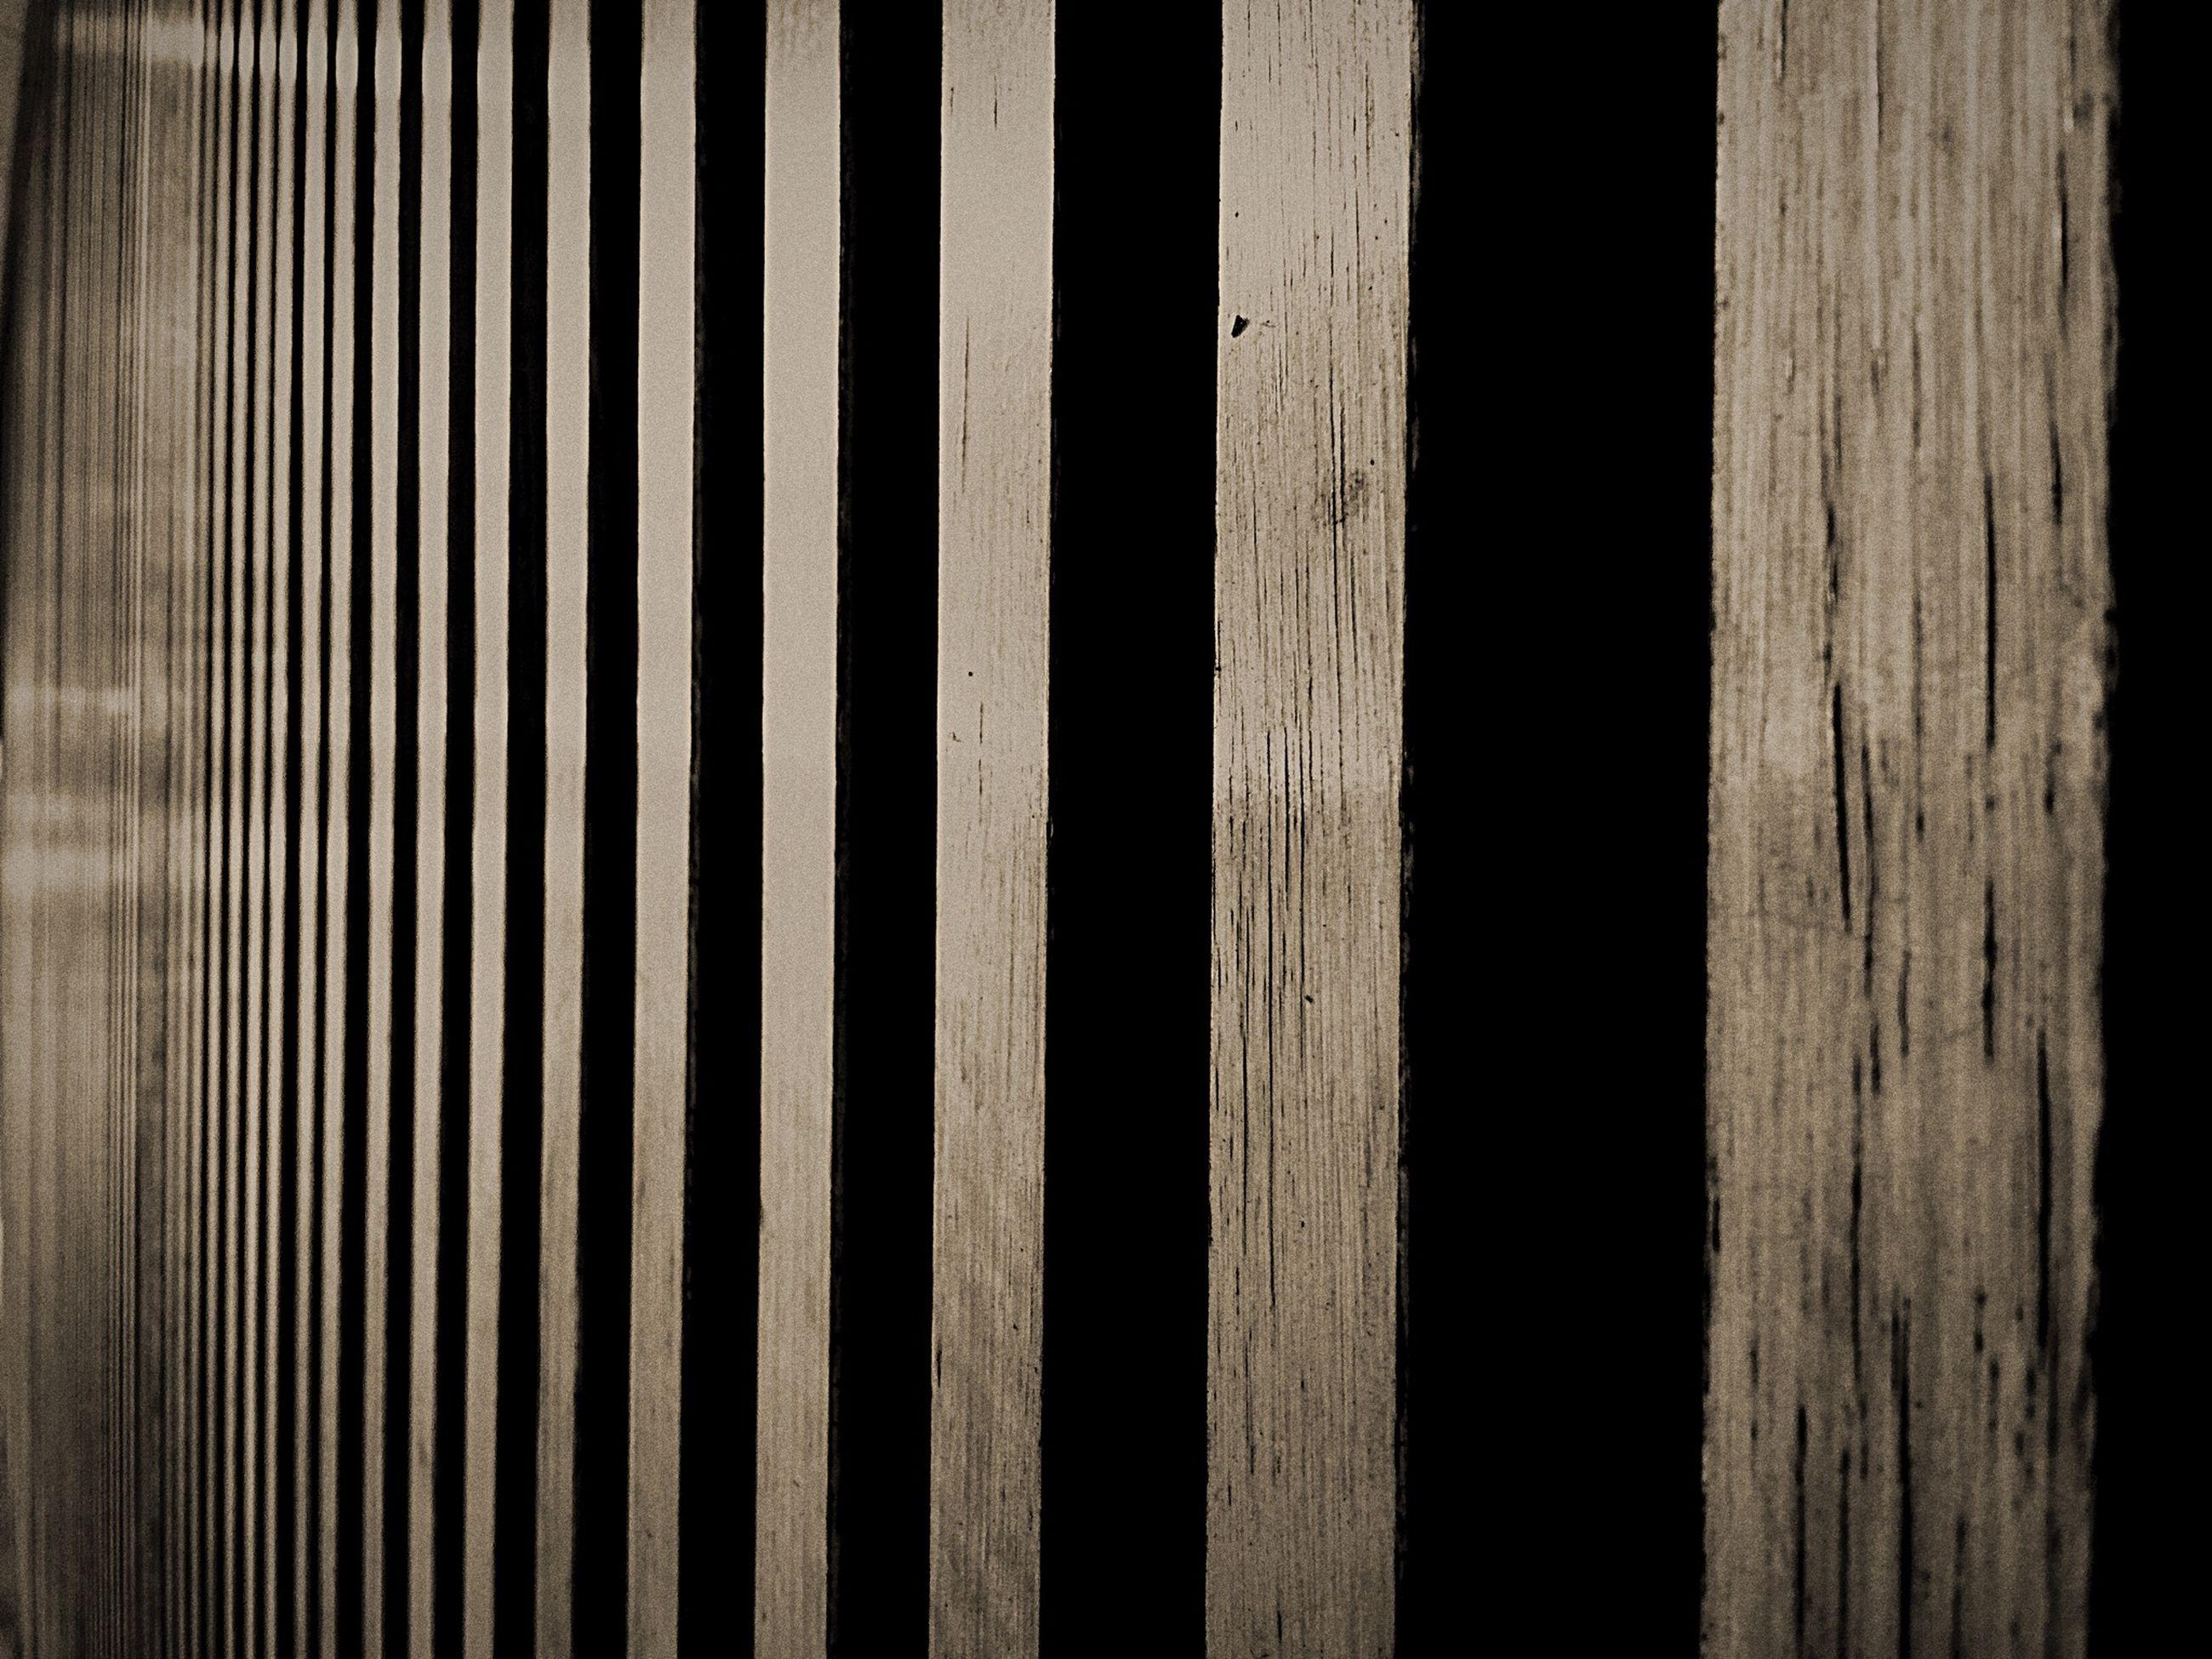 Detail shot of wooden wall